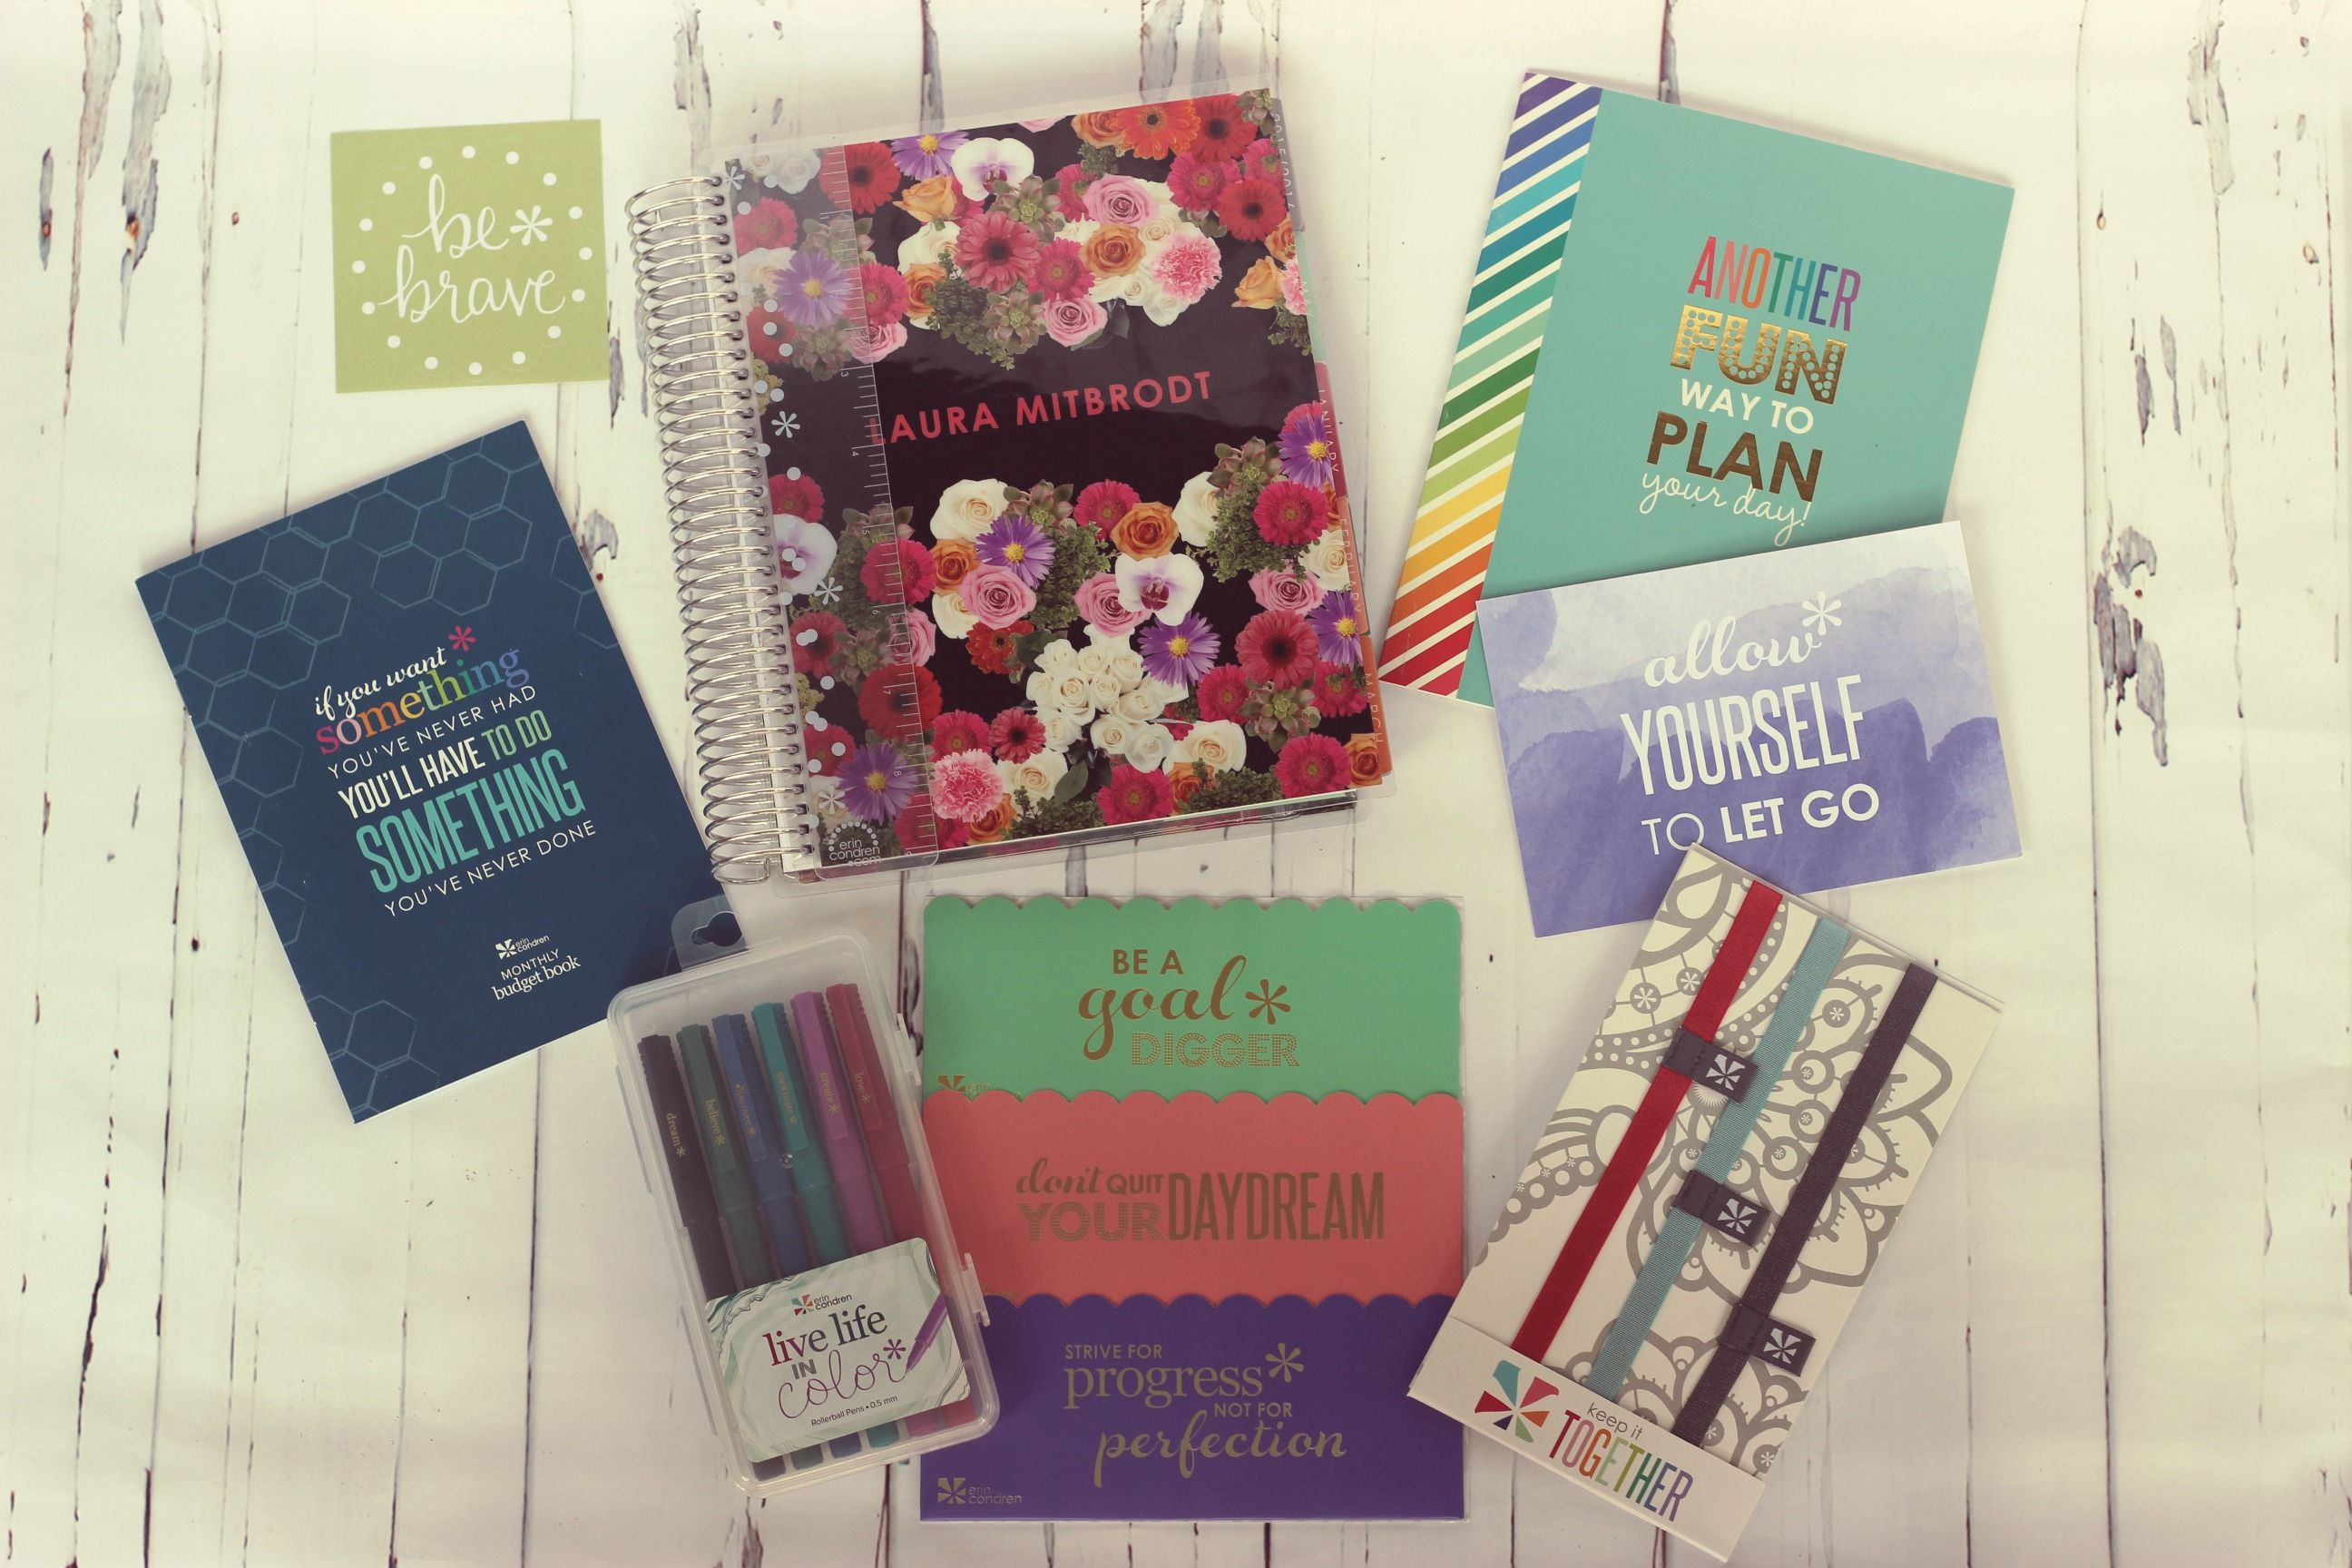 Erin Condren, Life Planner, Review, Best Planners, Agenda, Fashion blogger, planing, organize, guide, design,